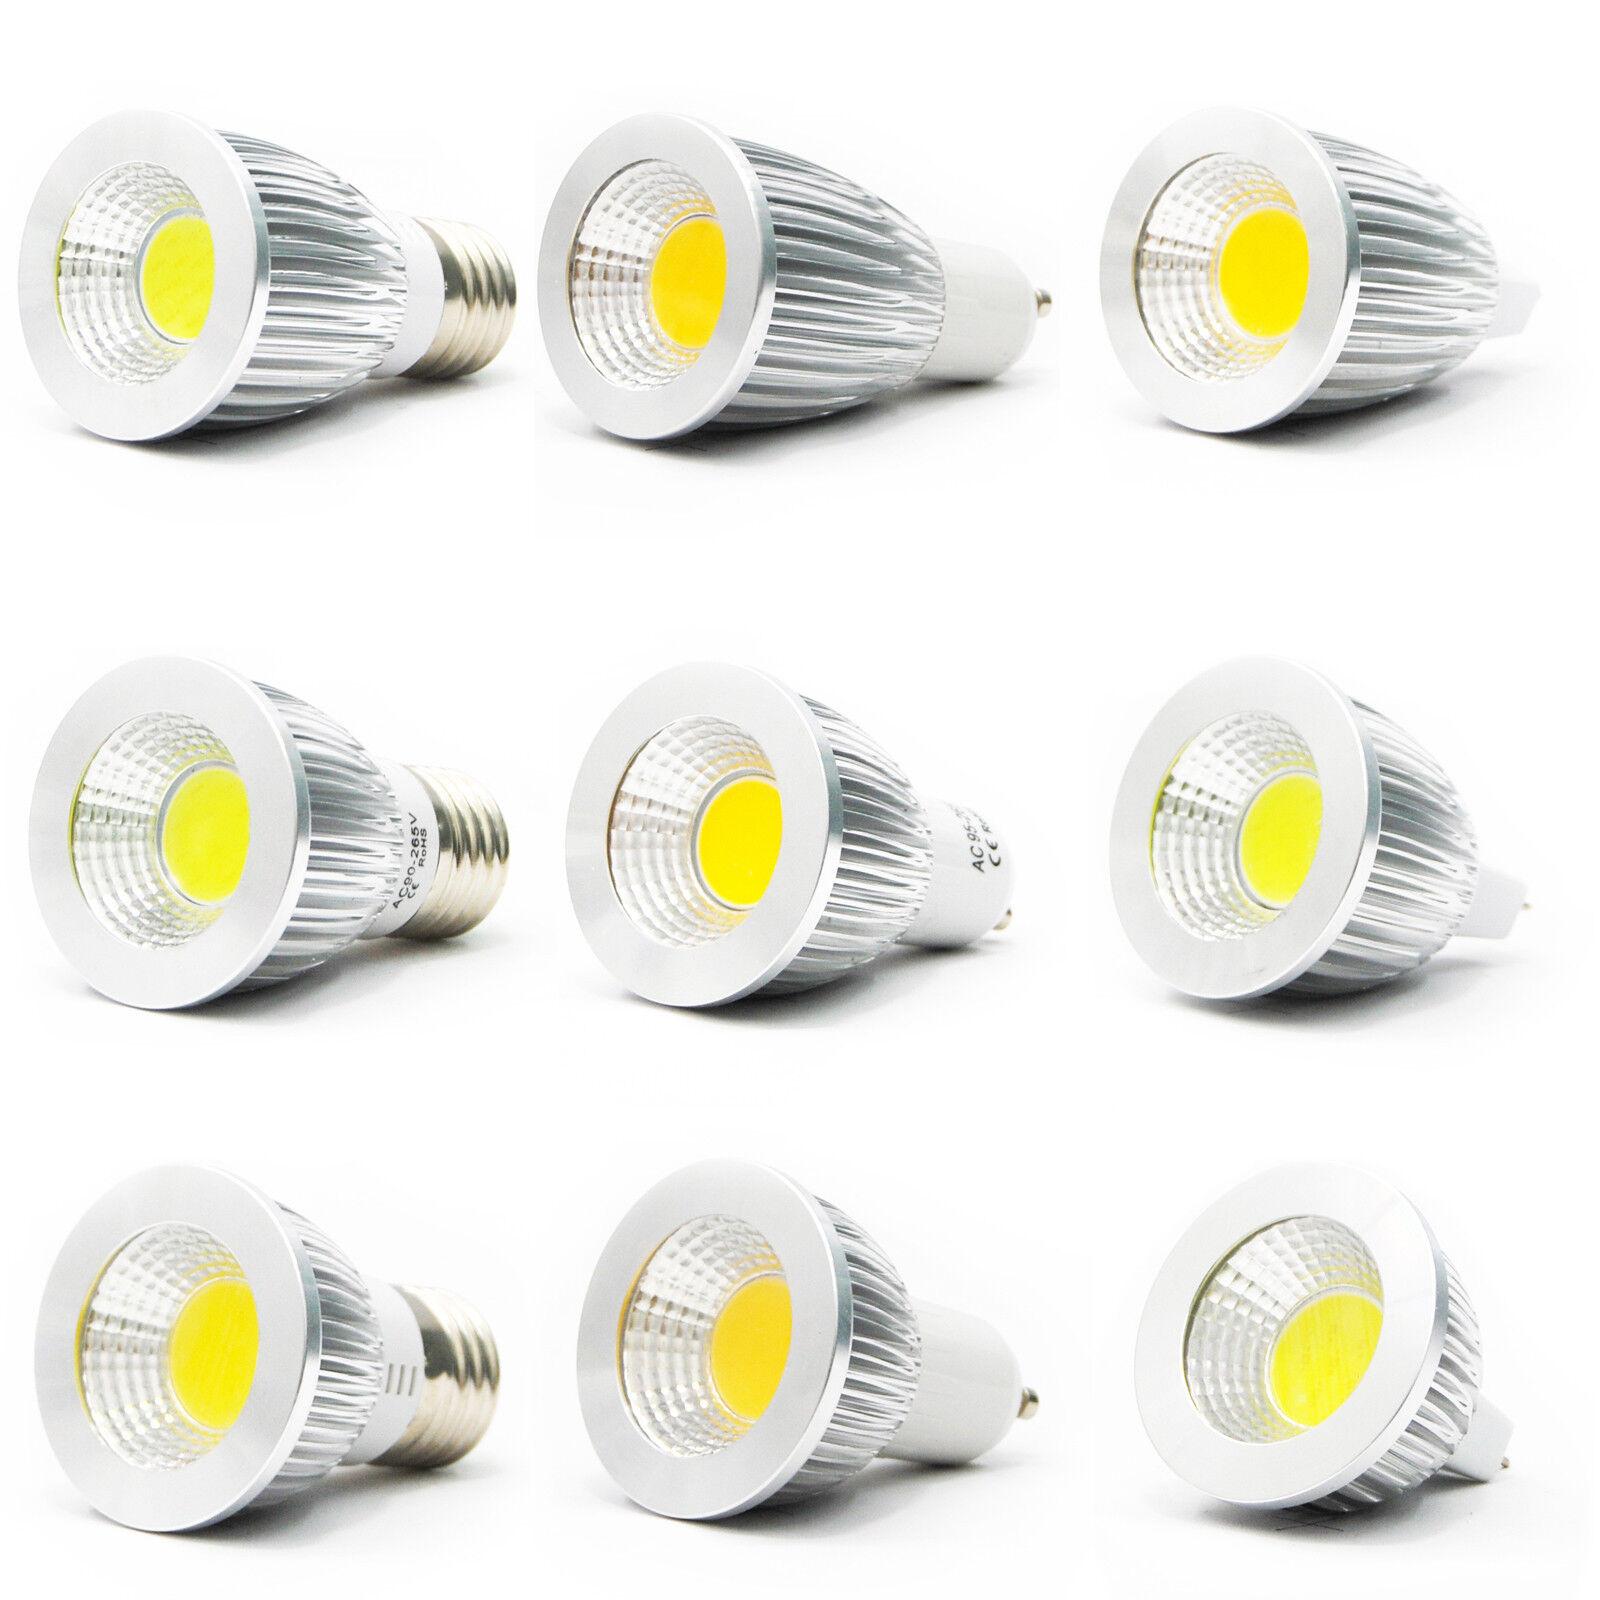 ultra bright mr16 gu10 e27 e12 dimmable led cob spot down light bulb 6w 9w 12w ebay. Black Bedroom Furniture Sets. Home Design Ideas